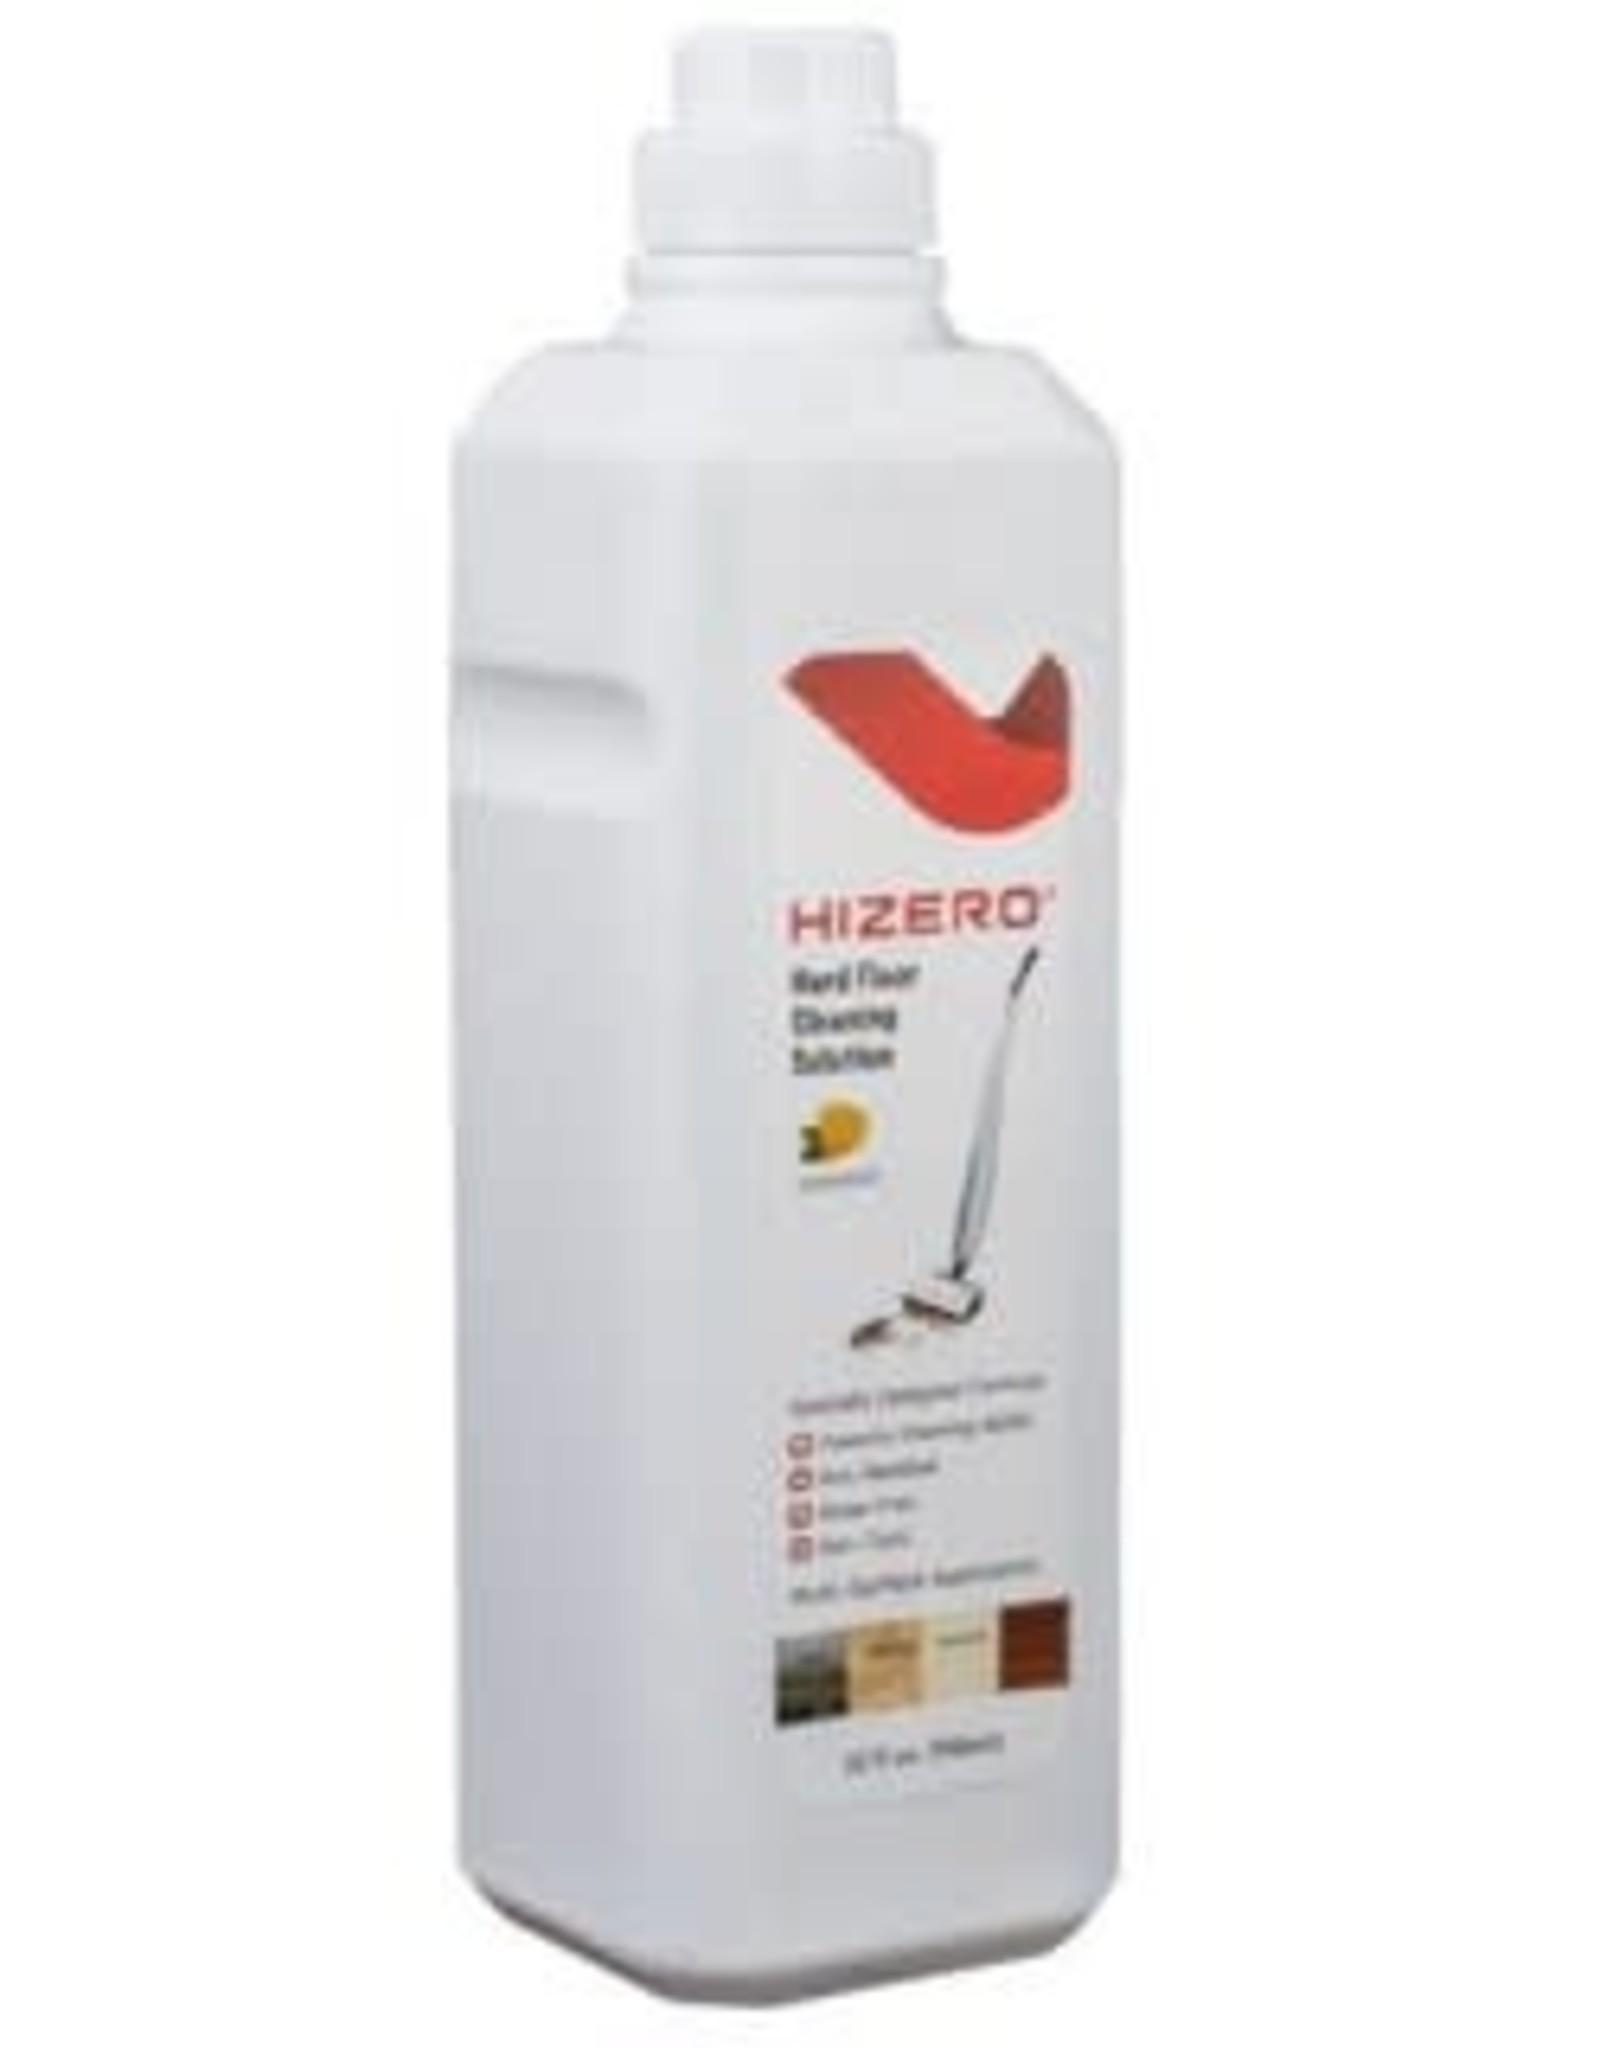 Hizero Hizero Floor Cleaner Solution Lemon Scent